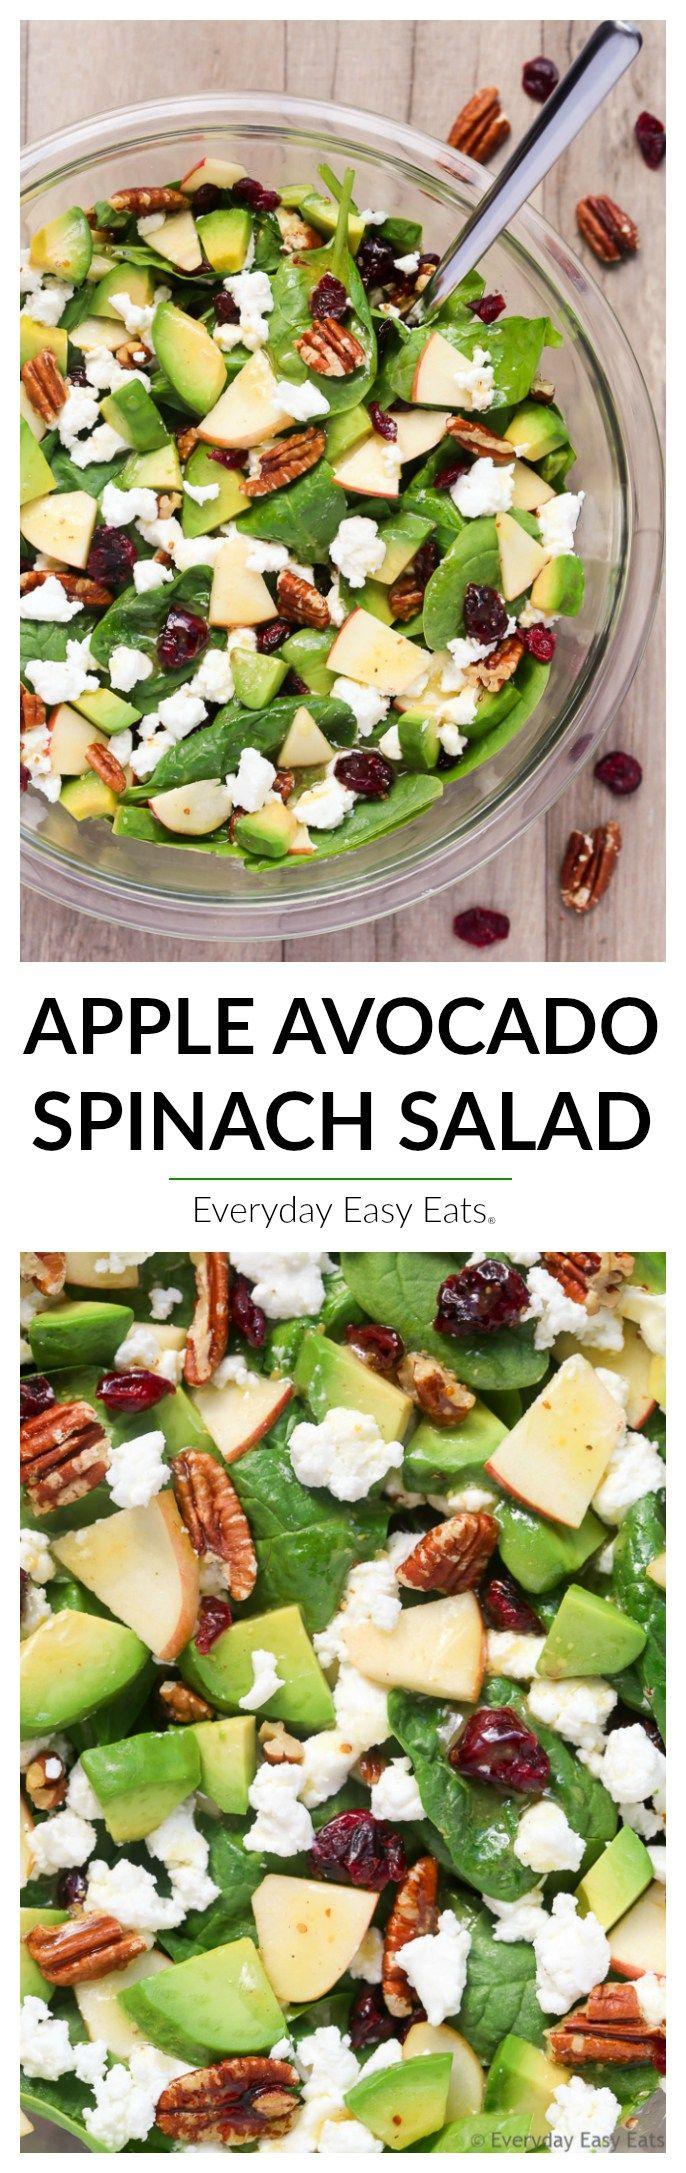 Photo of Apple Avocado Spinach Salad